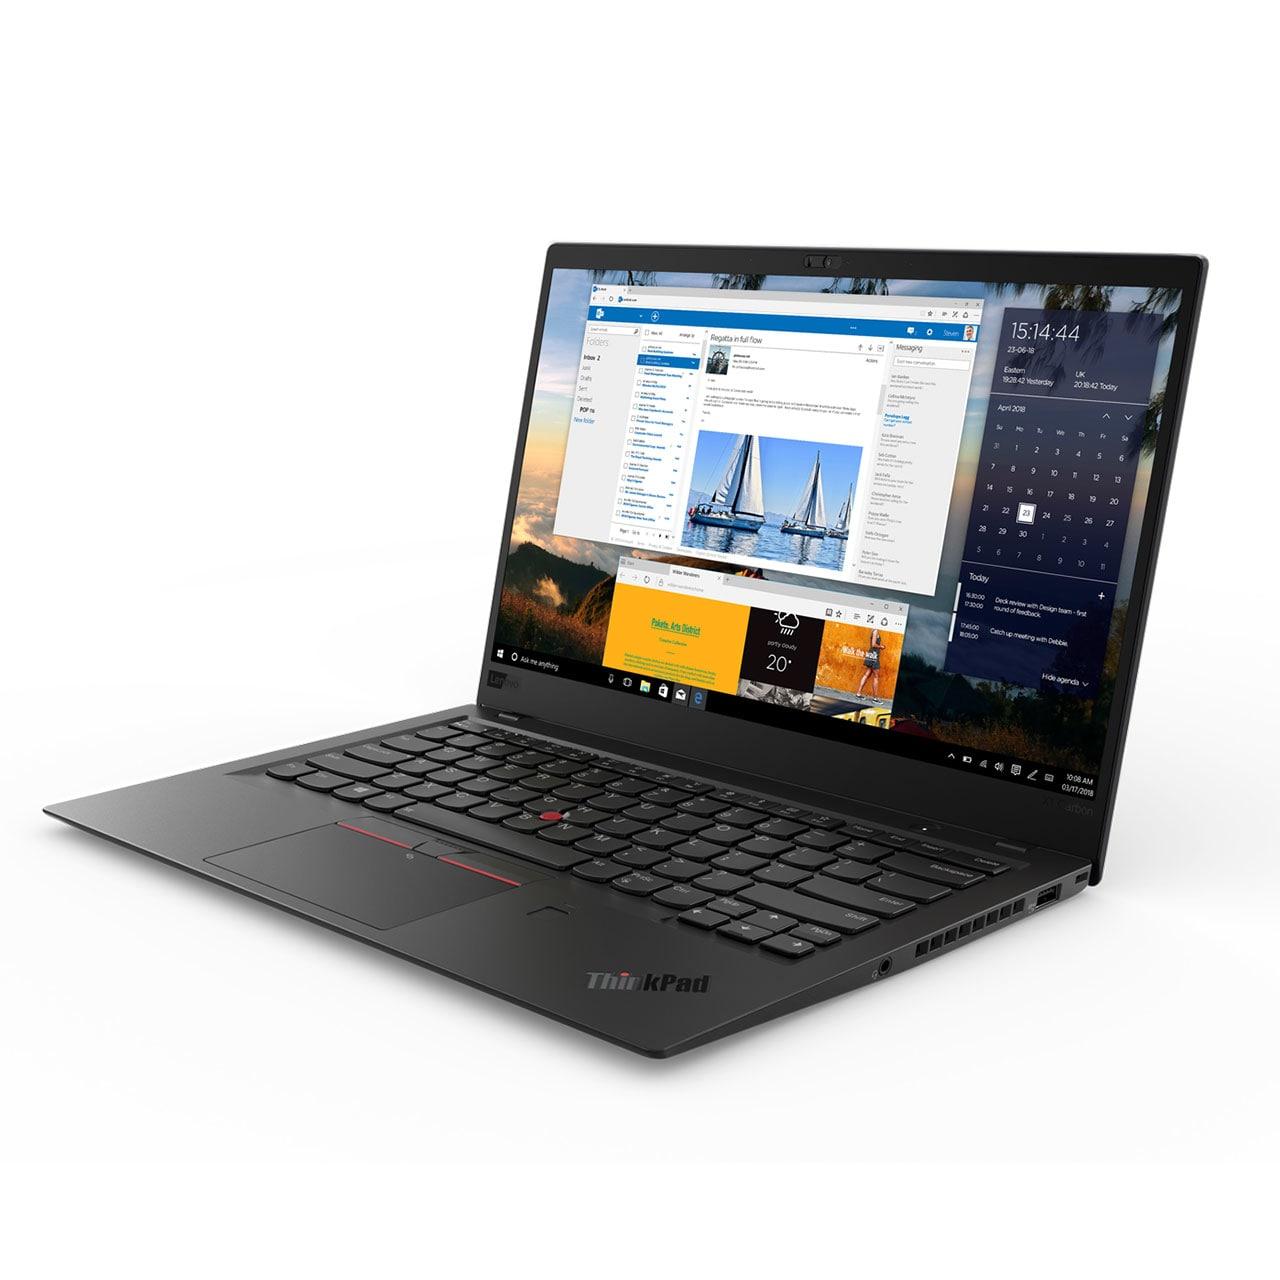 "Lenovo ThinkPad X1 Carbon 6th Generation, 14.0"", i7-8650U, 16 GB RAM, 512GB SSD, Win 10 Pro 64 2"